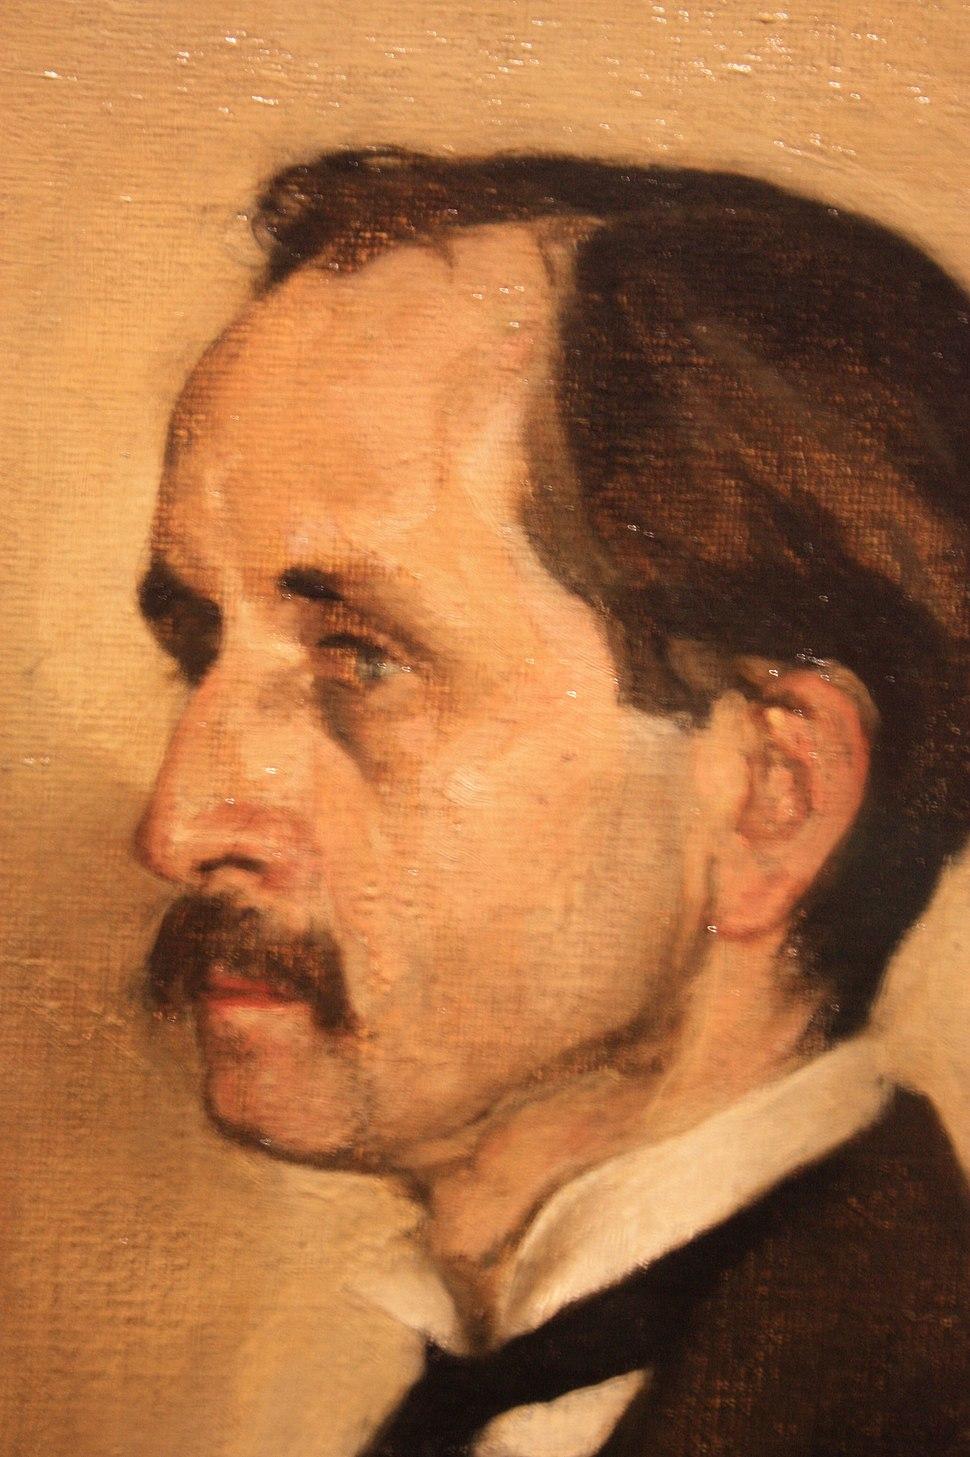 J M Barrie by Sir William Nicholson 1903, SNPG